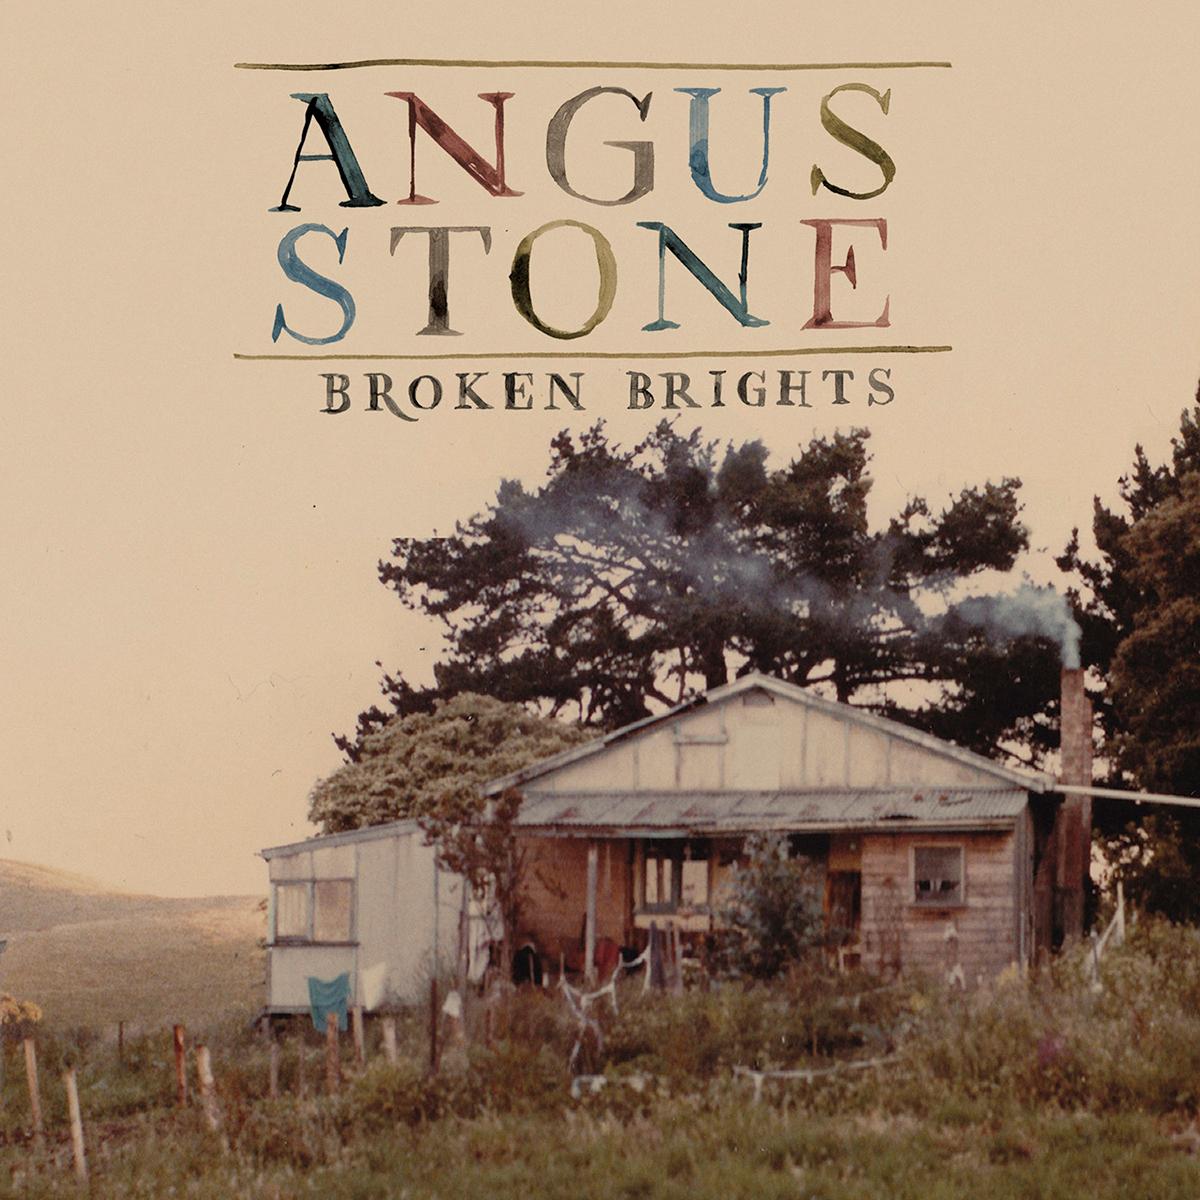 Angus Stone - Broken Brights CD